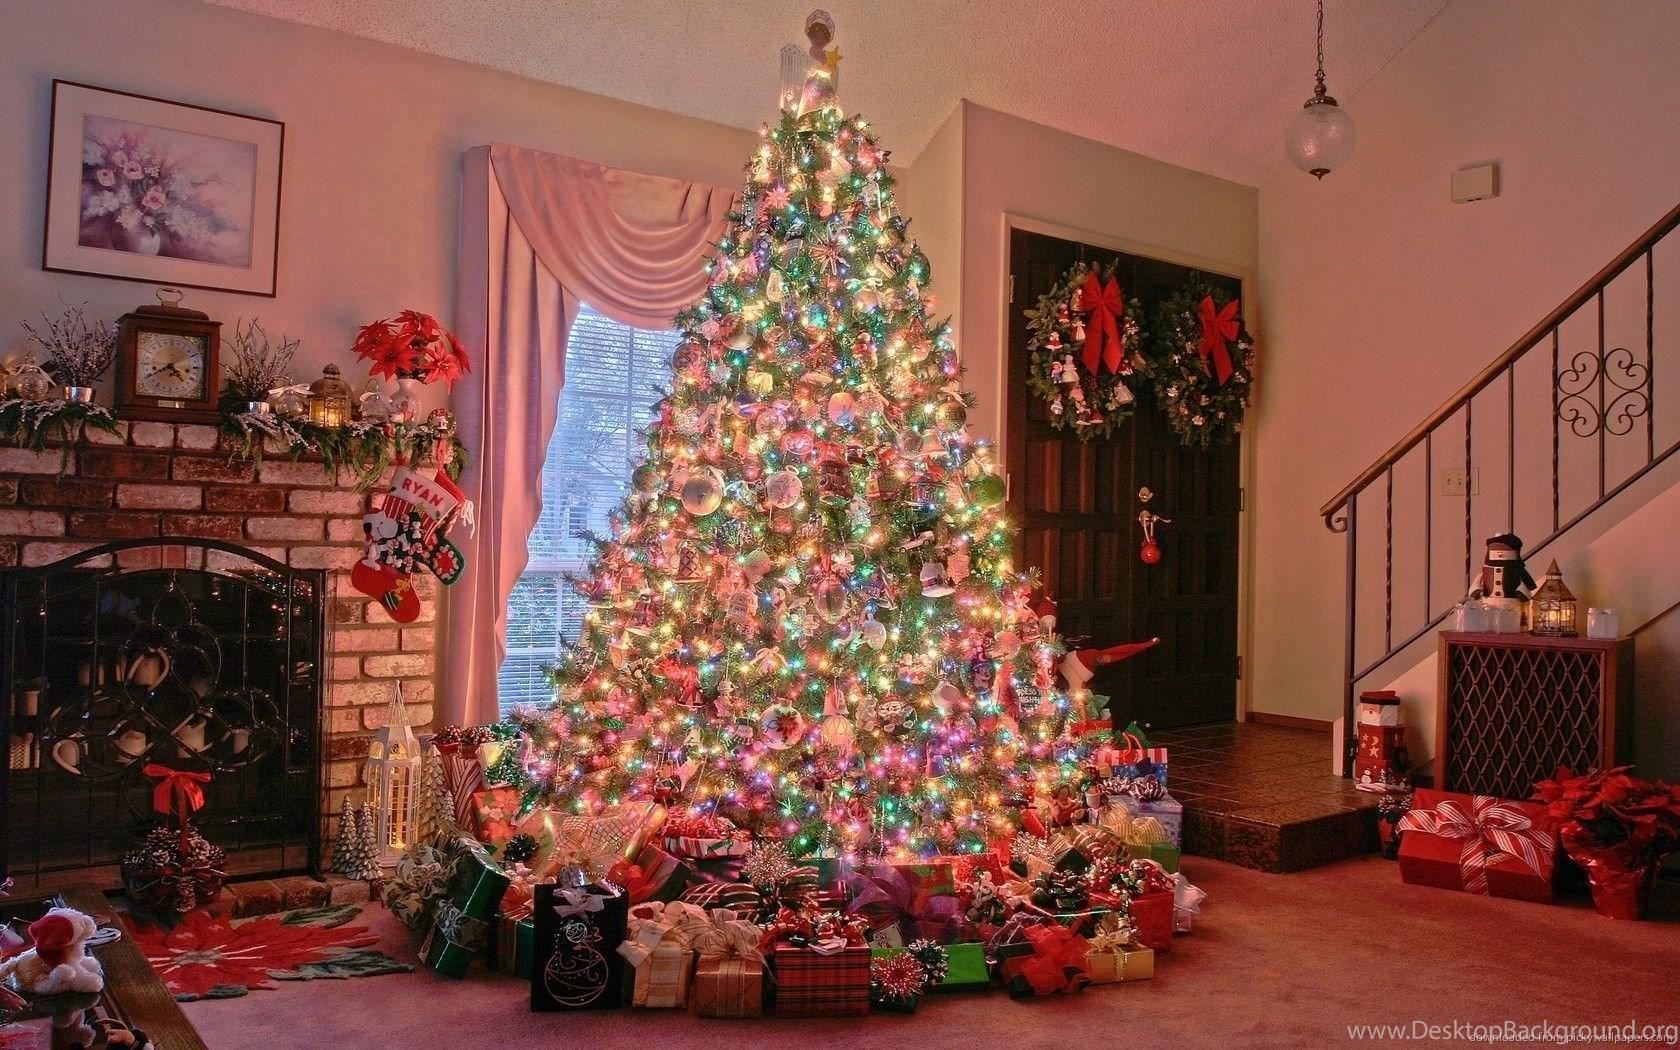 download 1680x1050 christmas tree near chimney wallpapers desktop